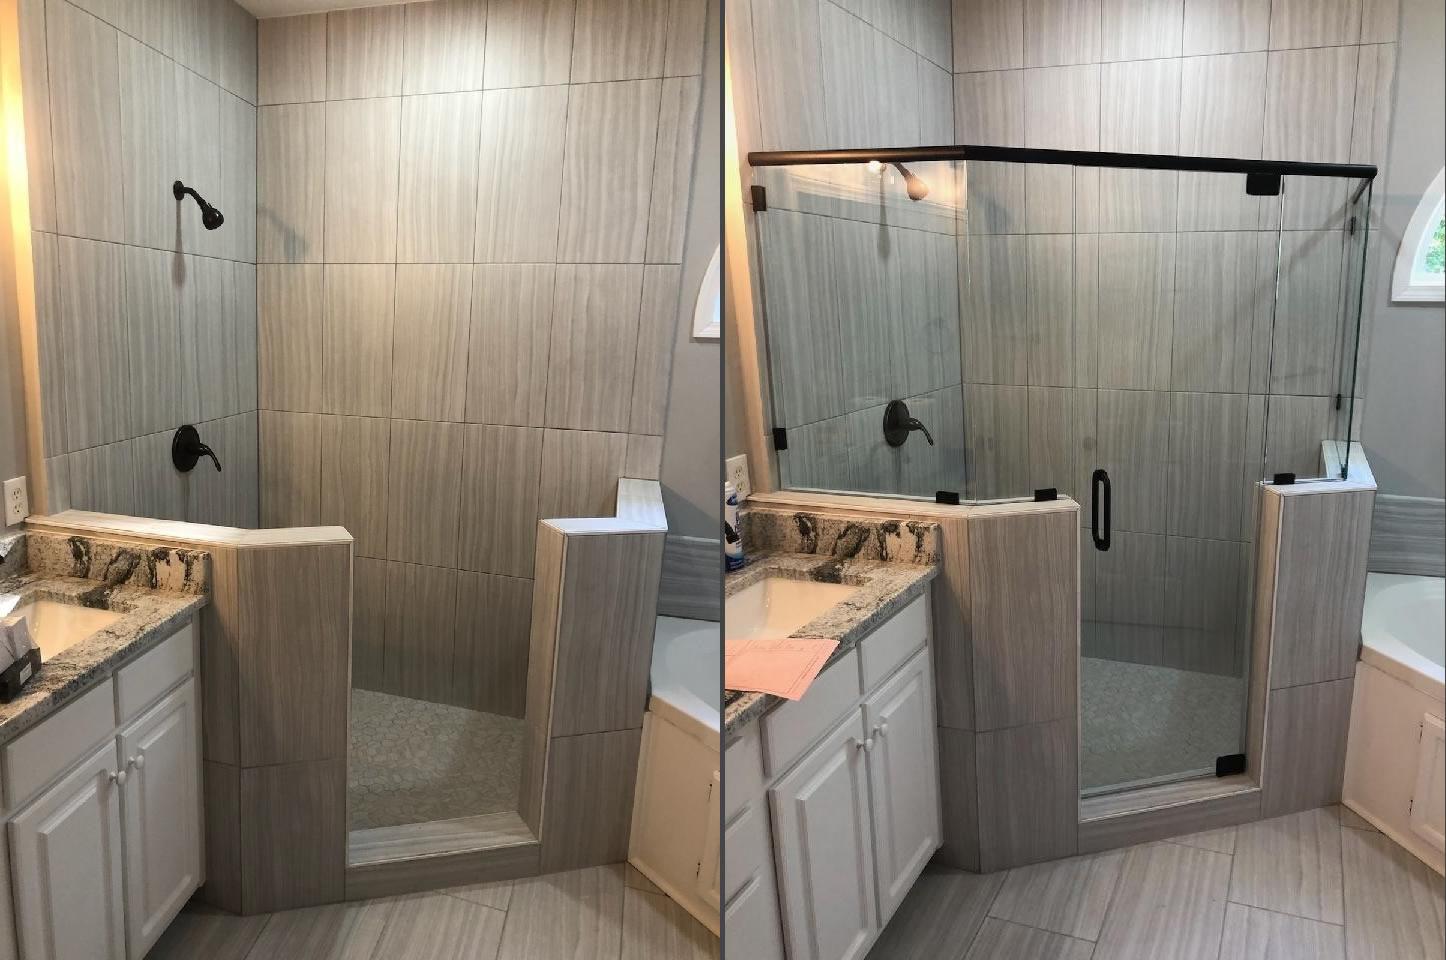 001 - Adairsville GA Semi-Frameless Shower Door Install